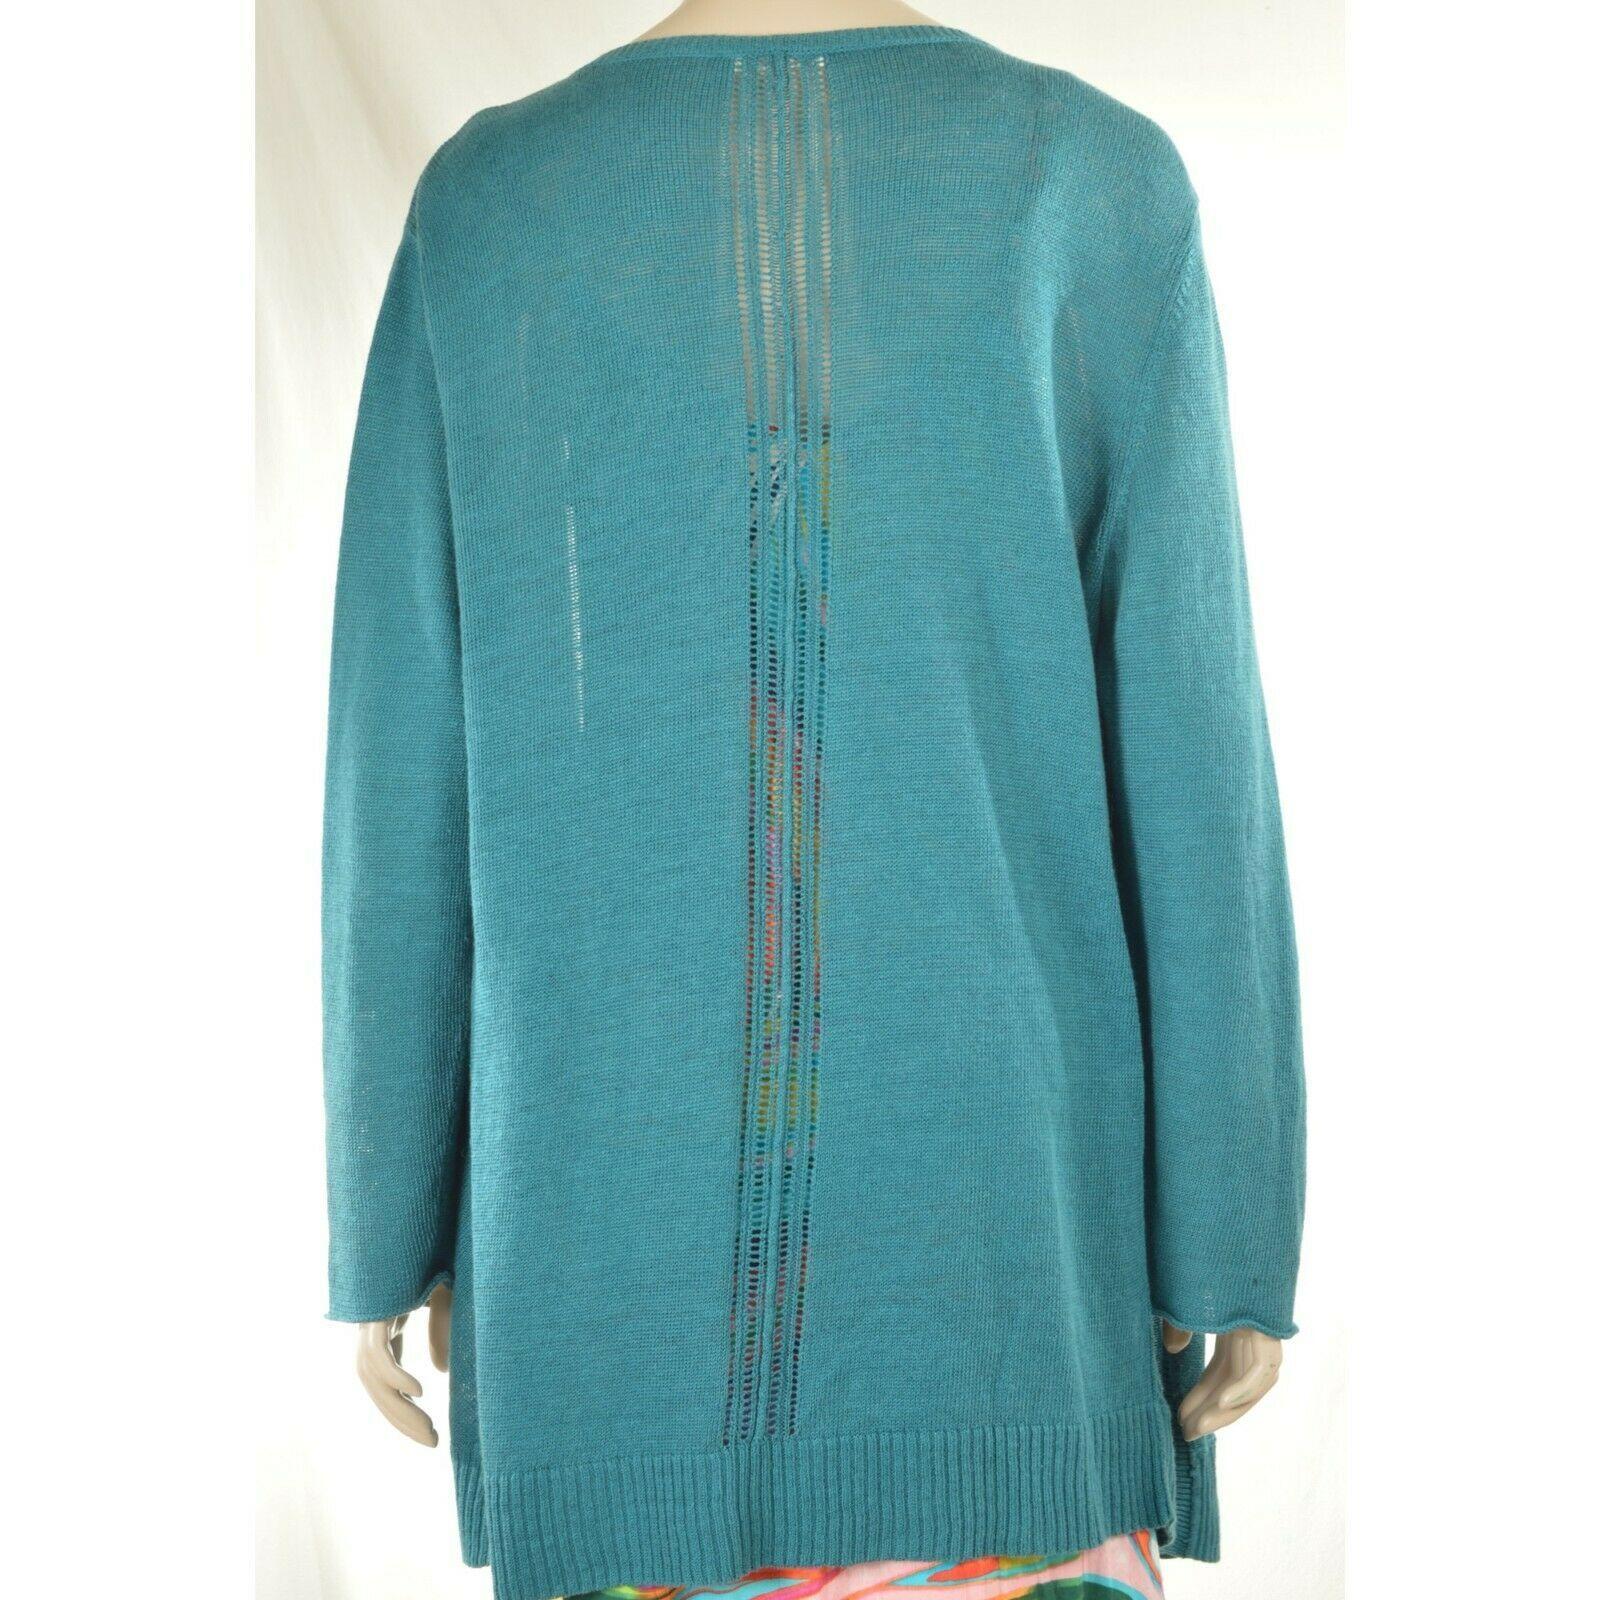 Eileen Fisher sweater cardigan SZ L teal 100% linen knit pockets soft long s image 3